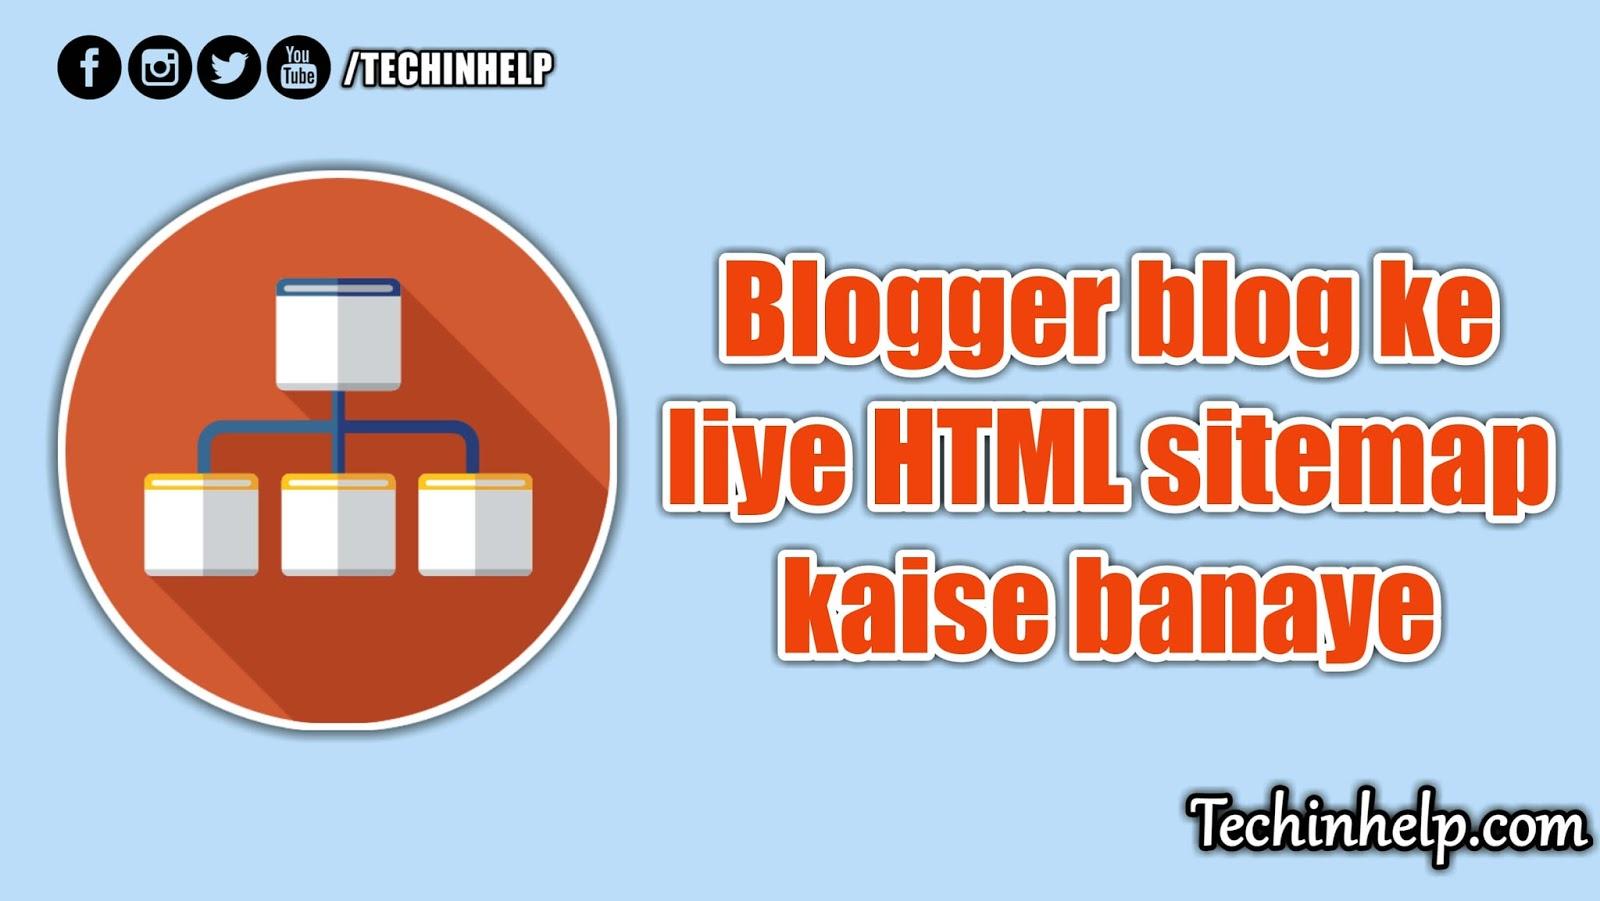 Blogger-blog-ke-liye-html-sitemap-kaise-banaye